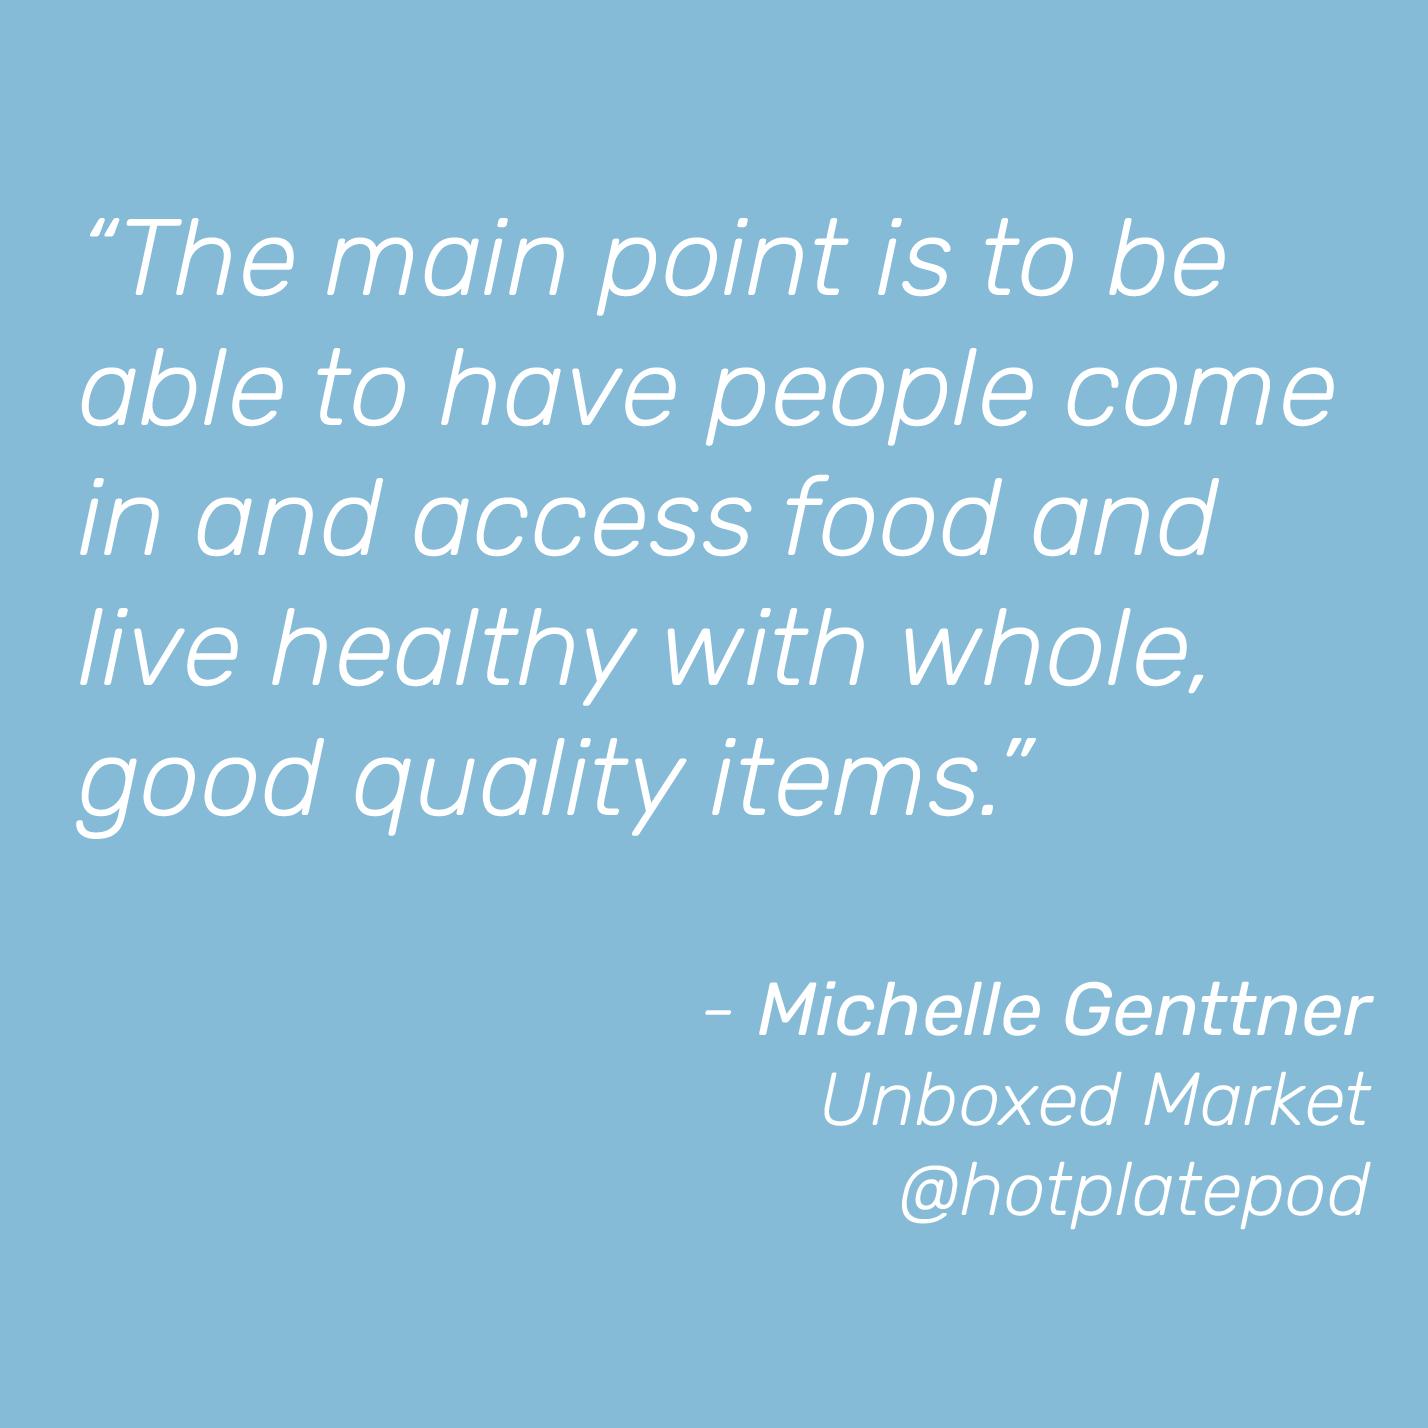 Michelle Genttner quote.png